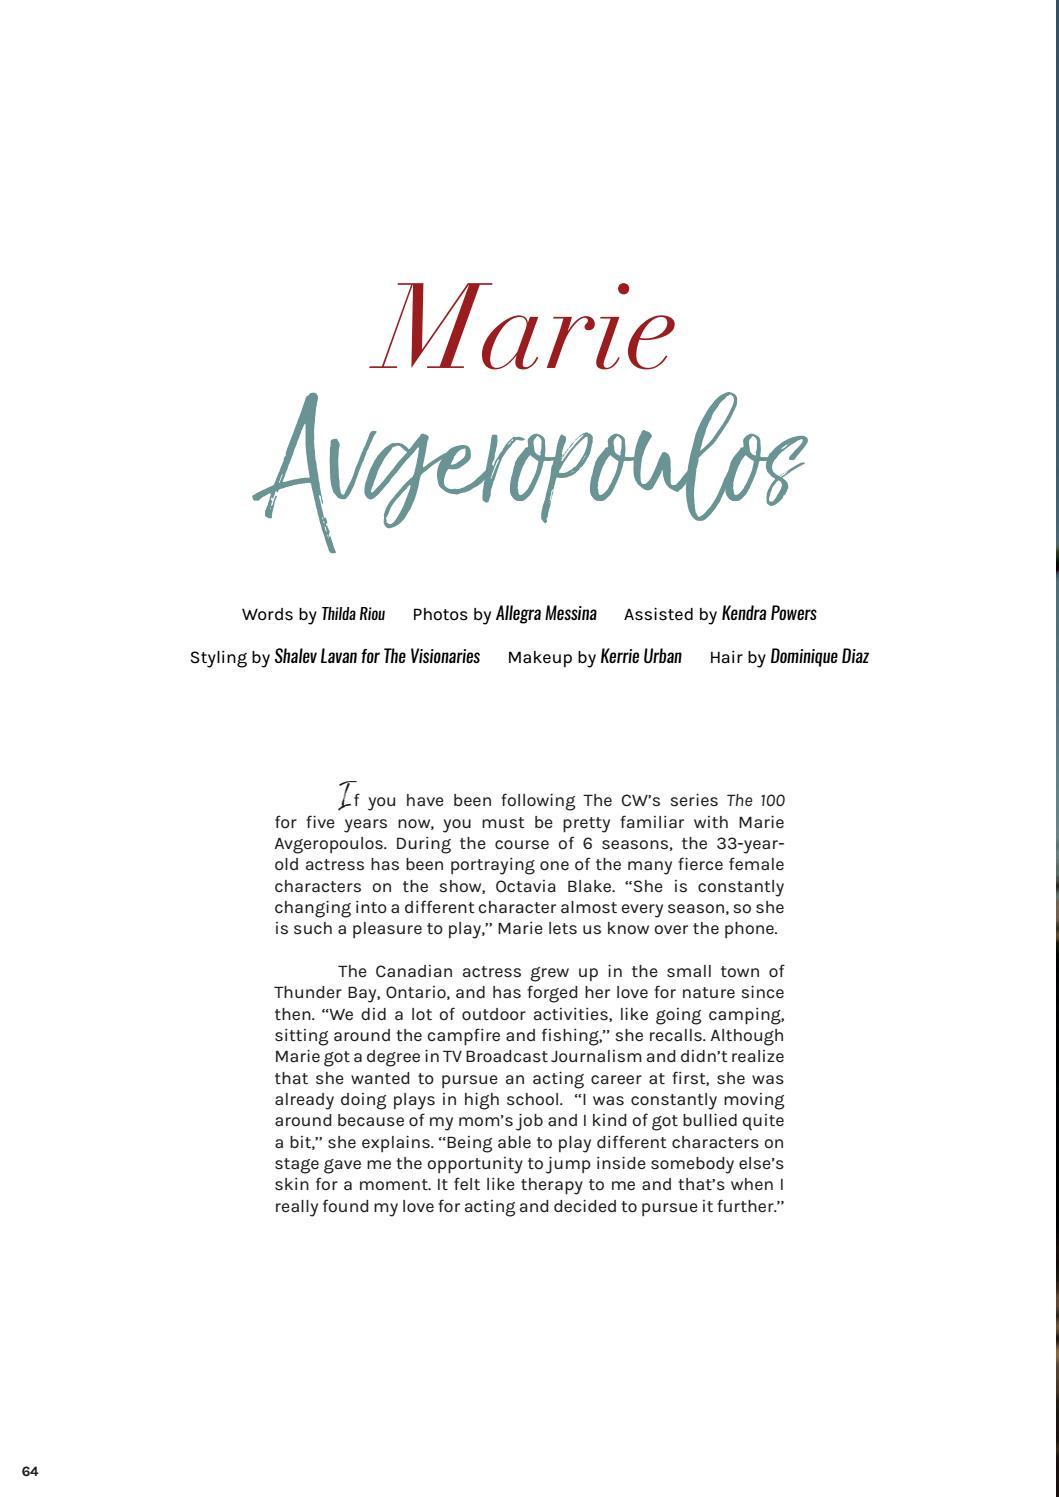 GRUMPY MAGAZINE #14 - Marie Avgeropoulos by Grumpy Magazine